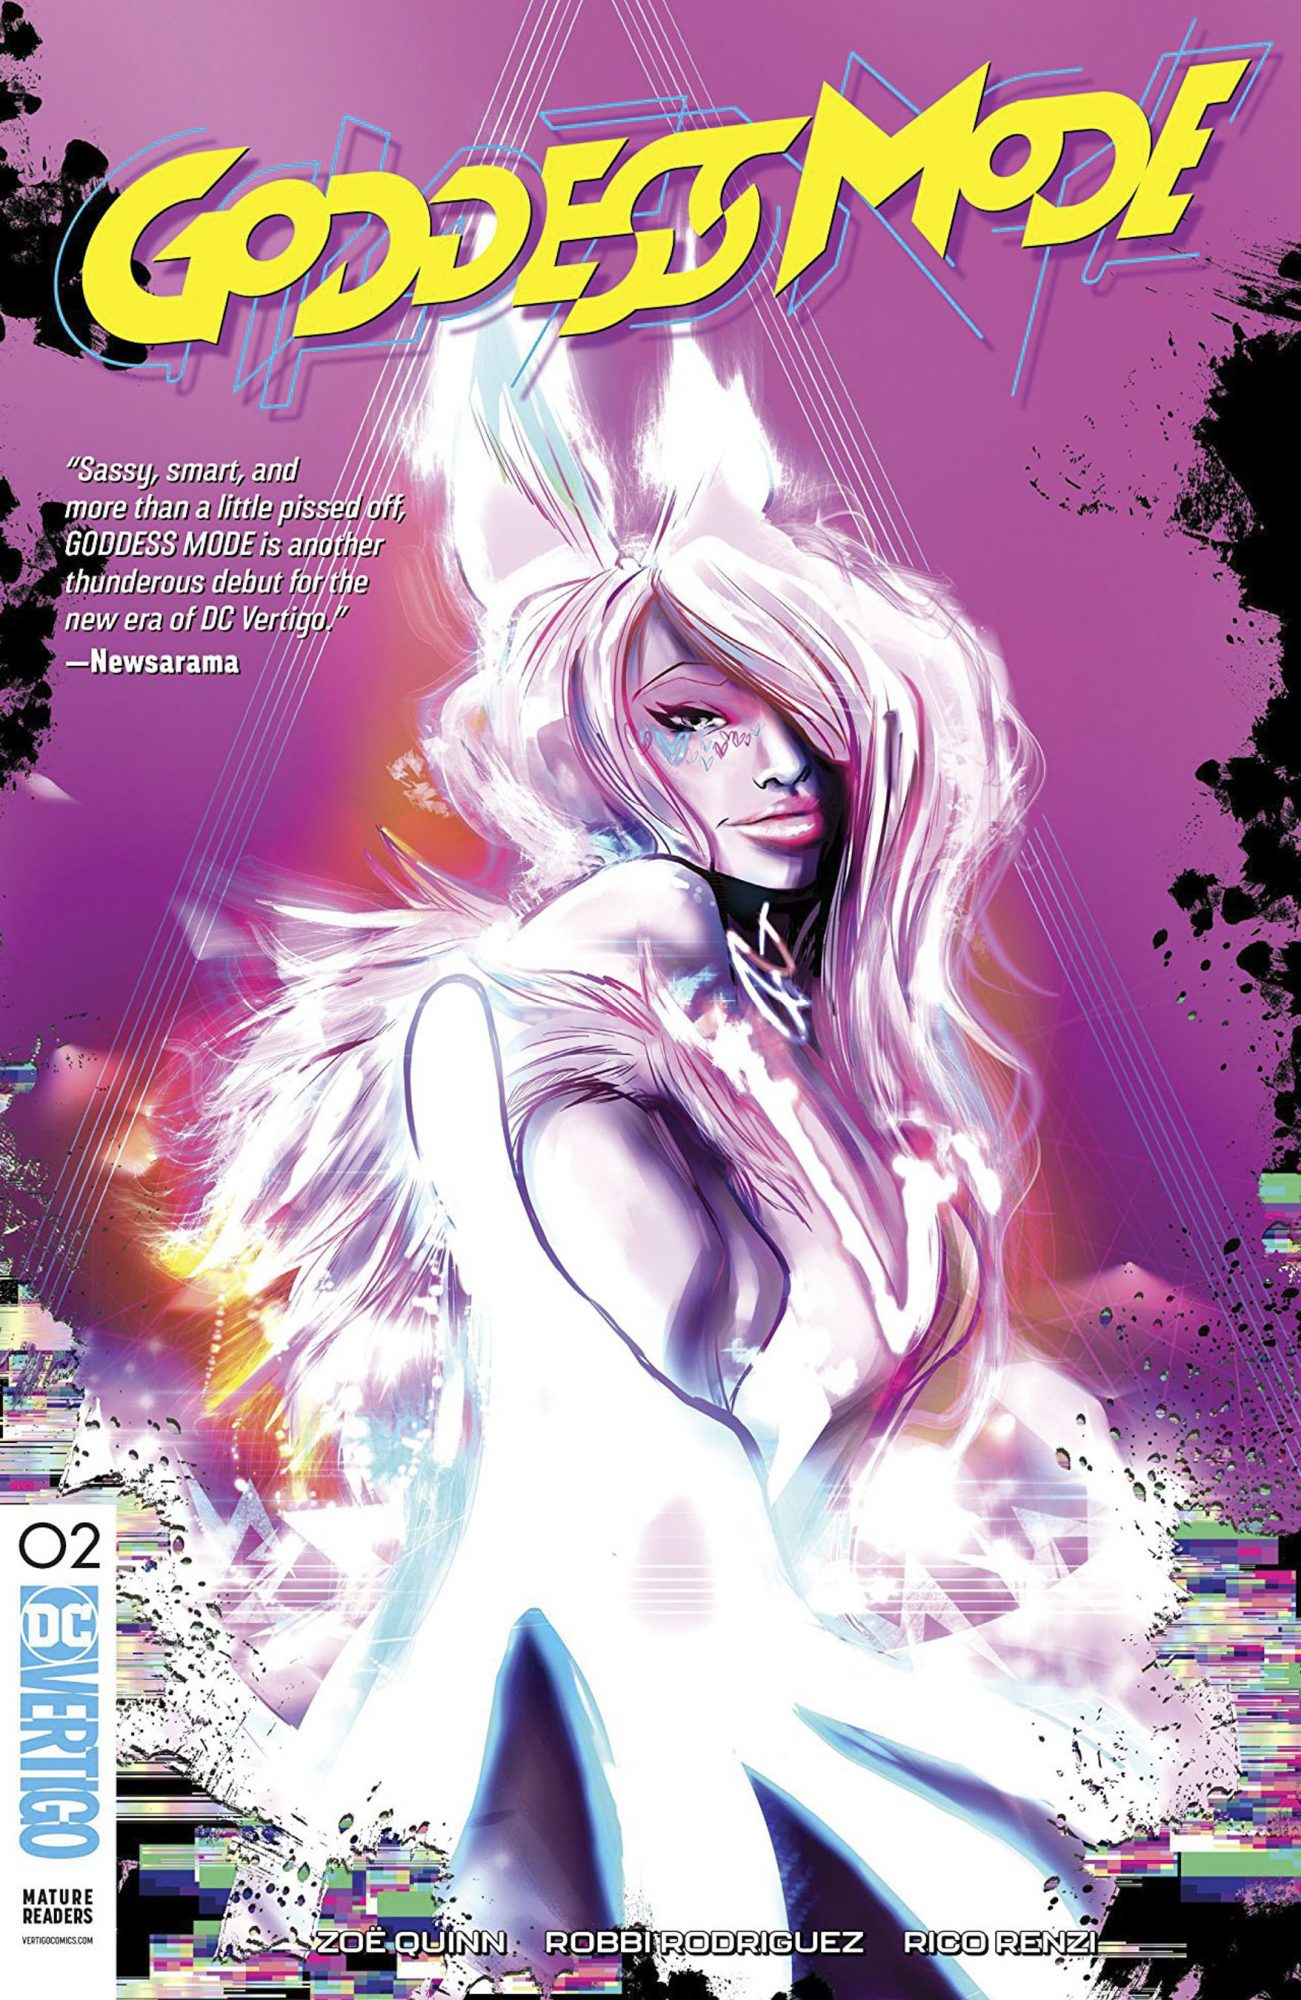 Cover._SX1280_QL80_TTD_ (1)